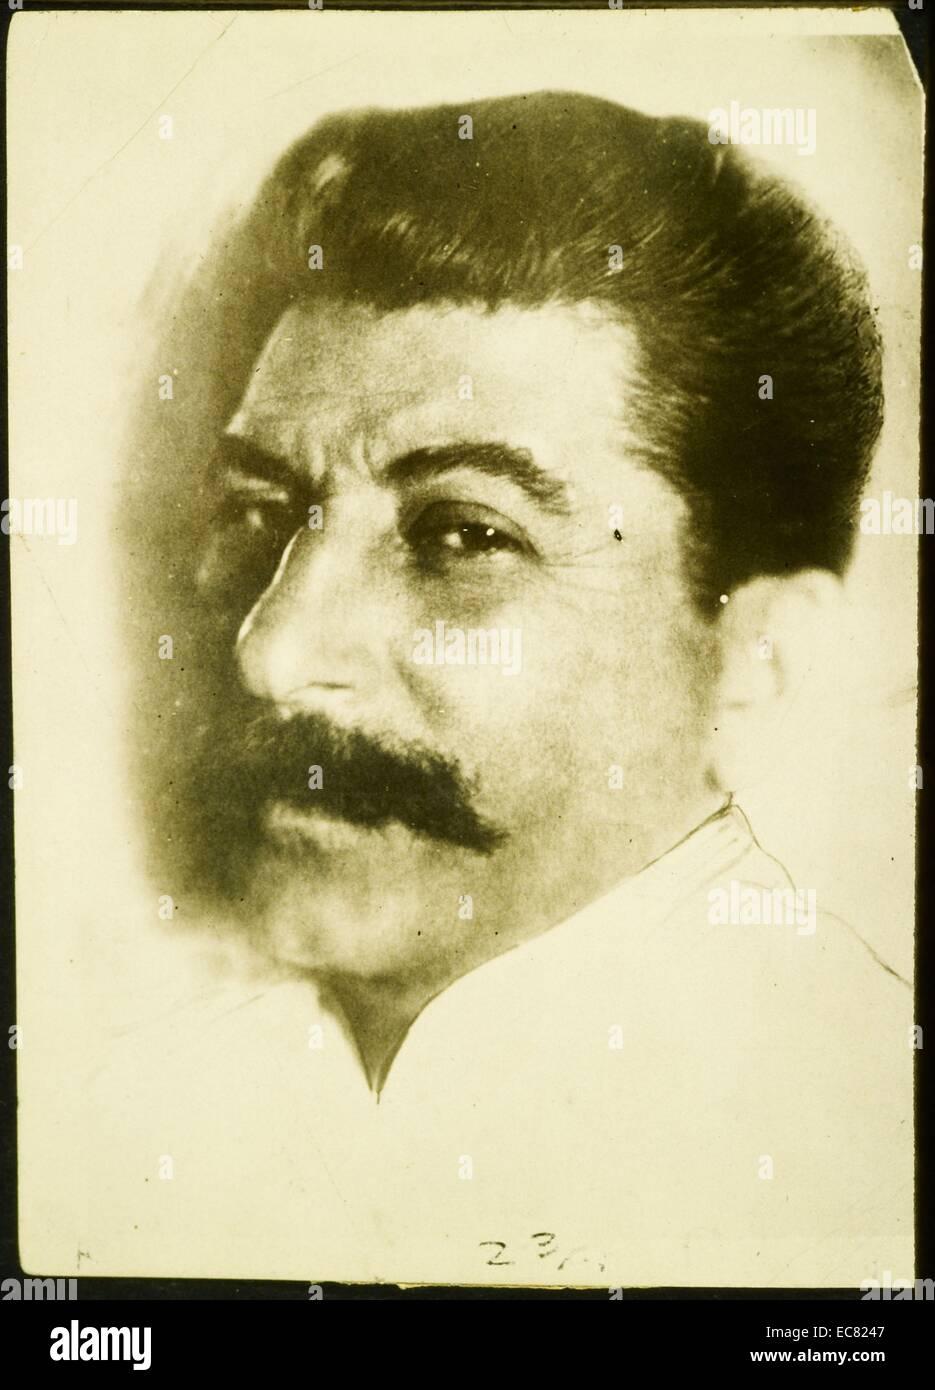 Colour Portrait of Joseph Stalin - Stock Image